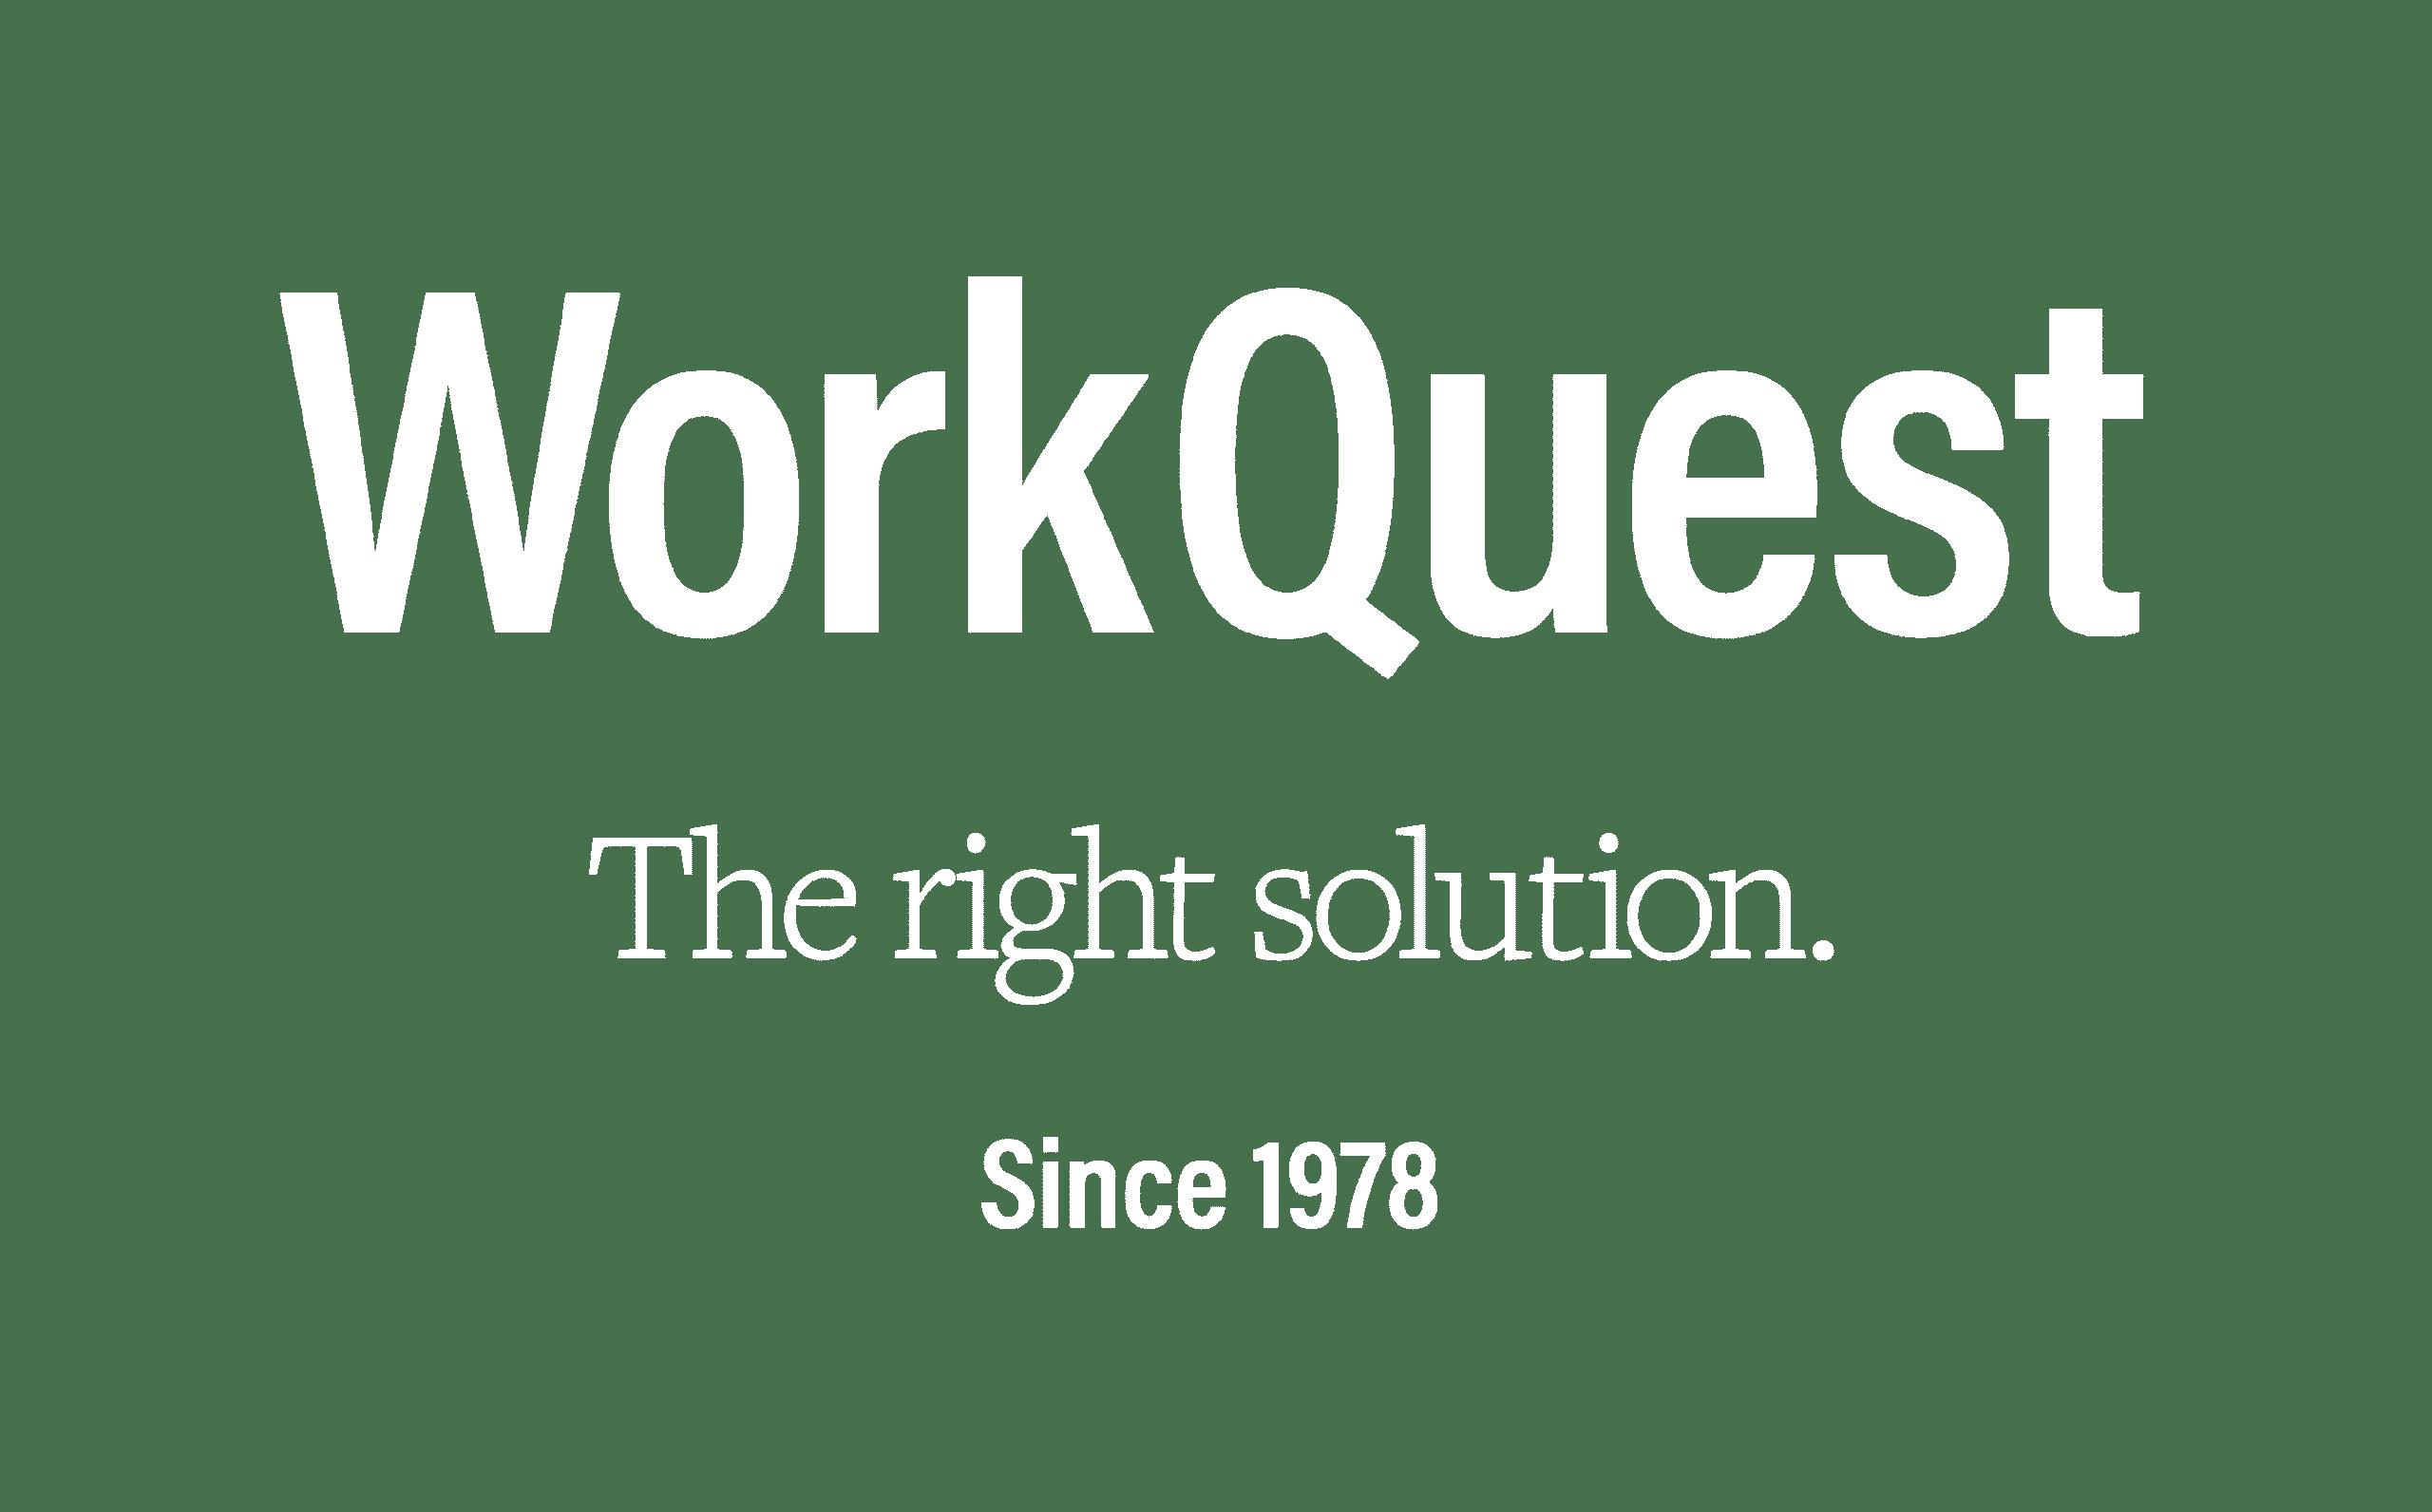 WorkQuest